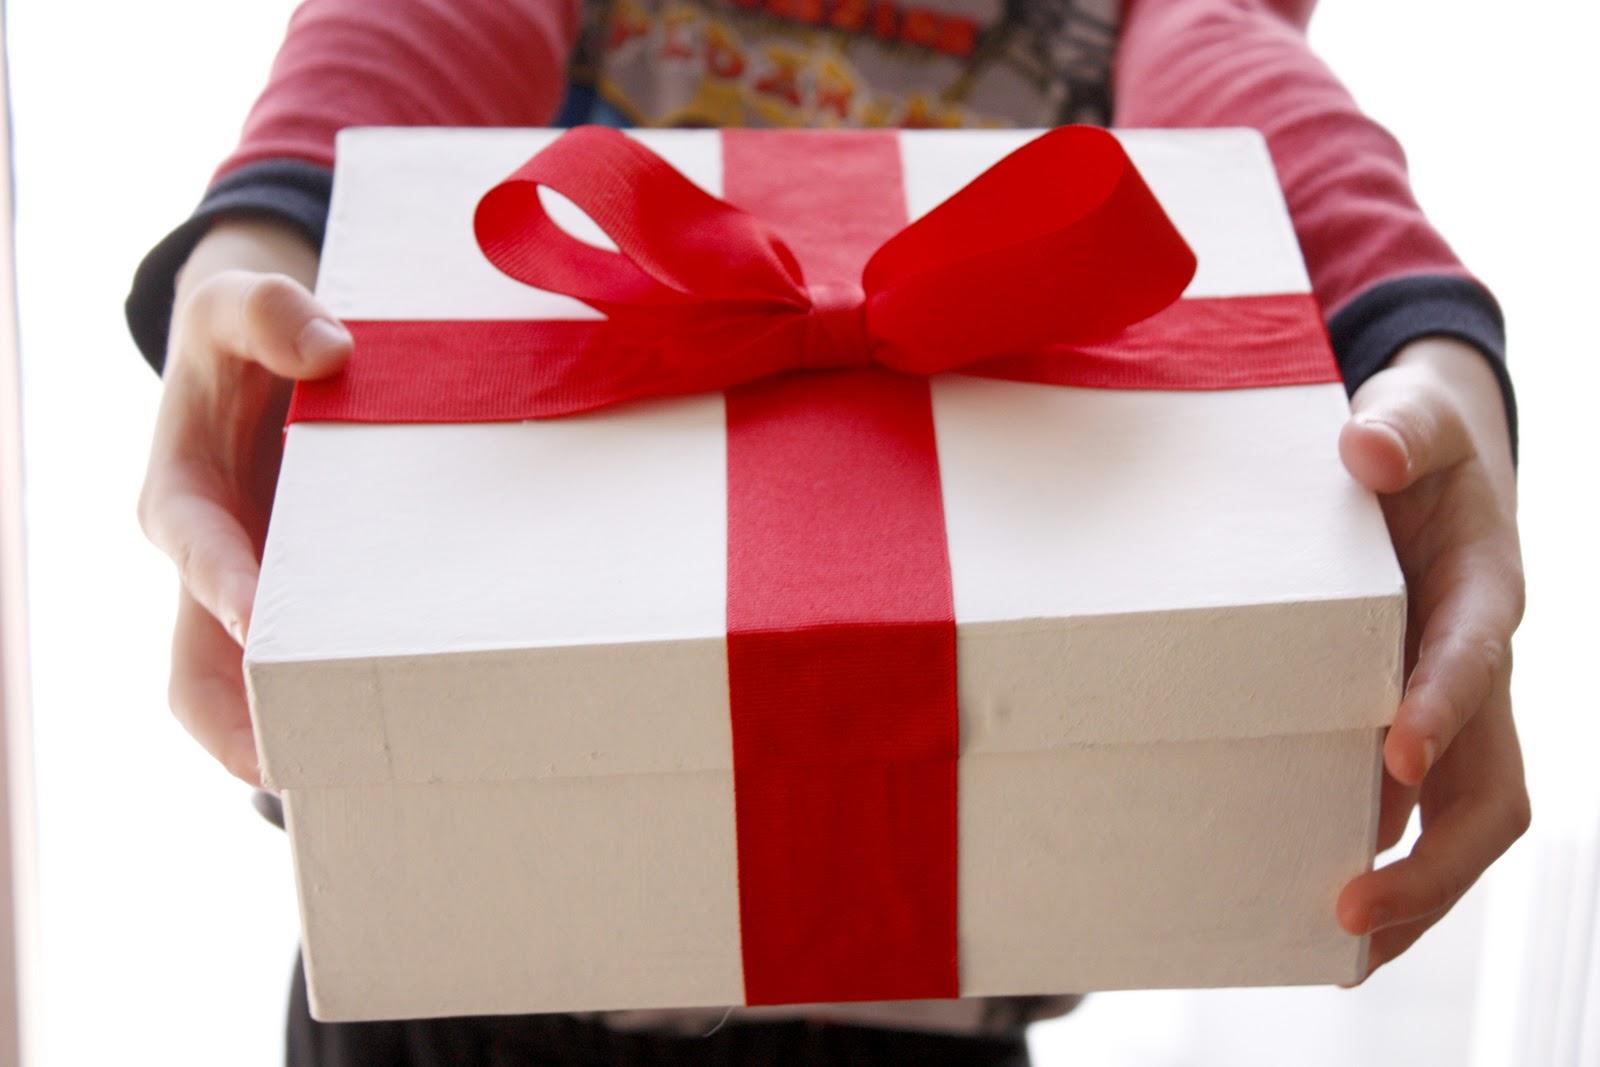 Акция Подарок другу за заказ : Группа Скидки, акции 49